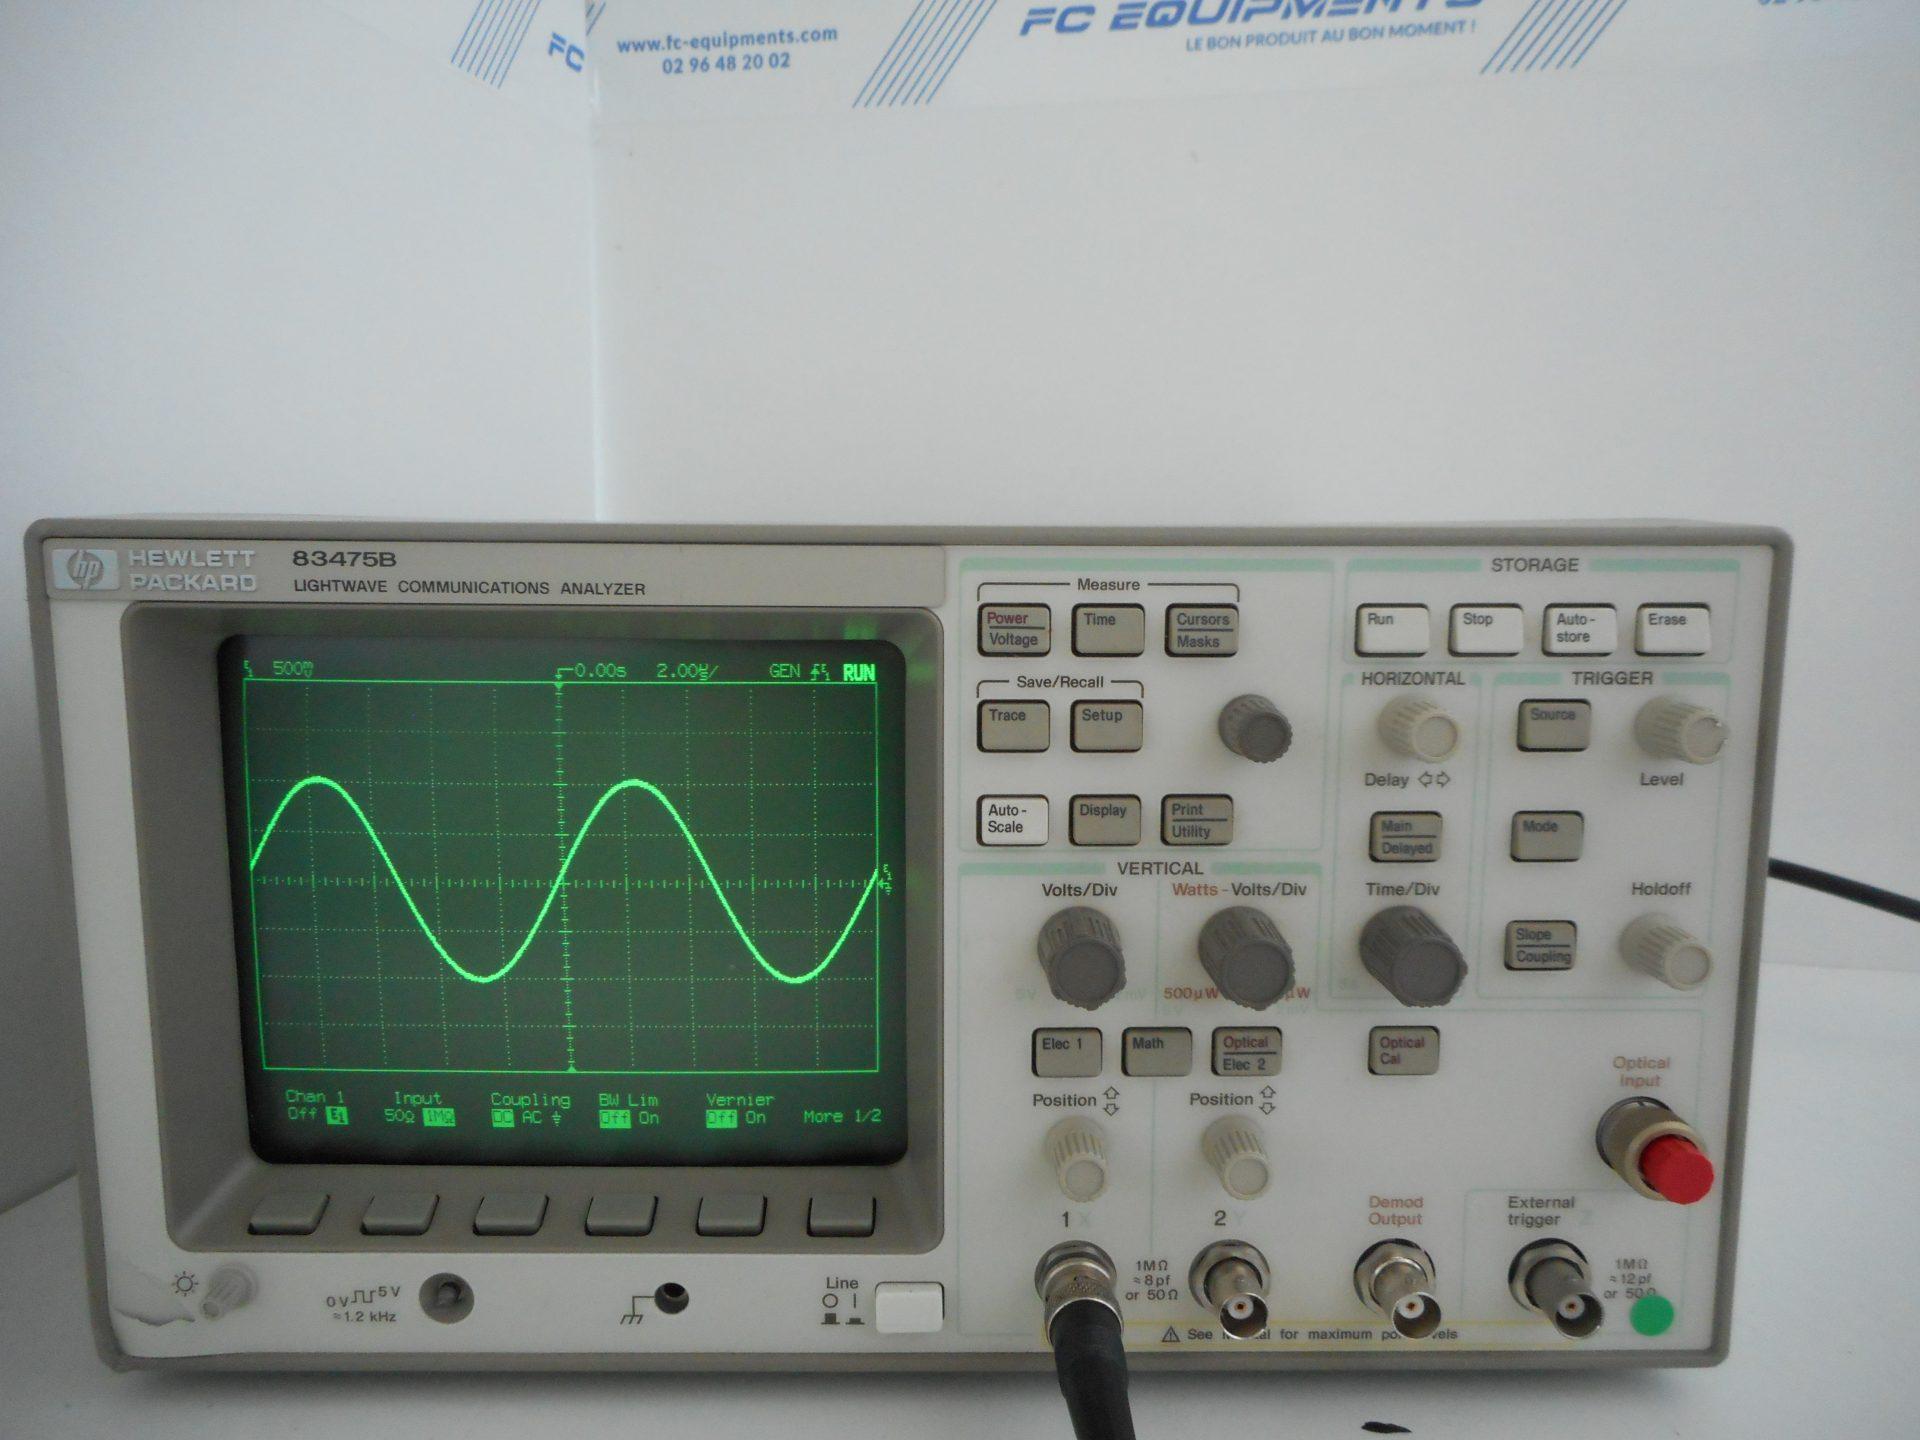 LIGHTWAVE COMMUNICATION ANALYZER - KEYSIGHT TECHNOLOGIES (AGILENT/HP)